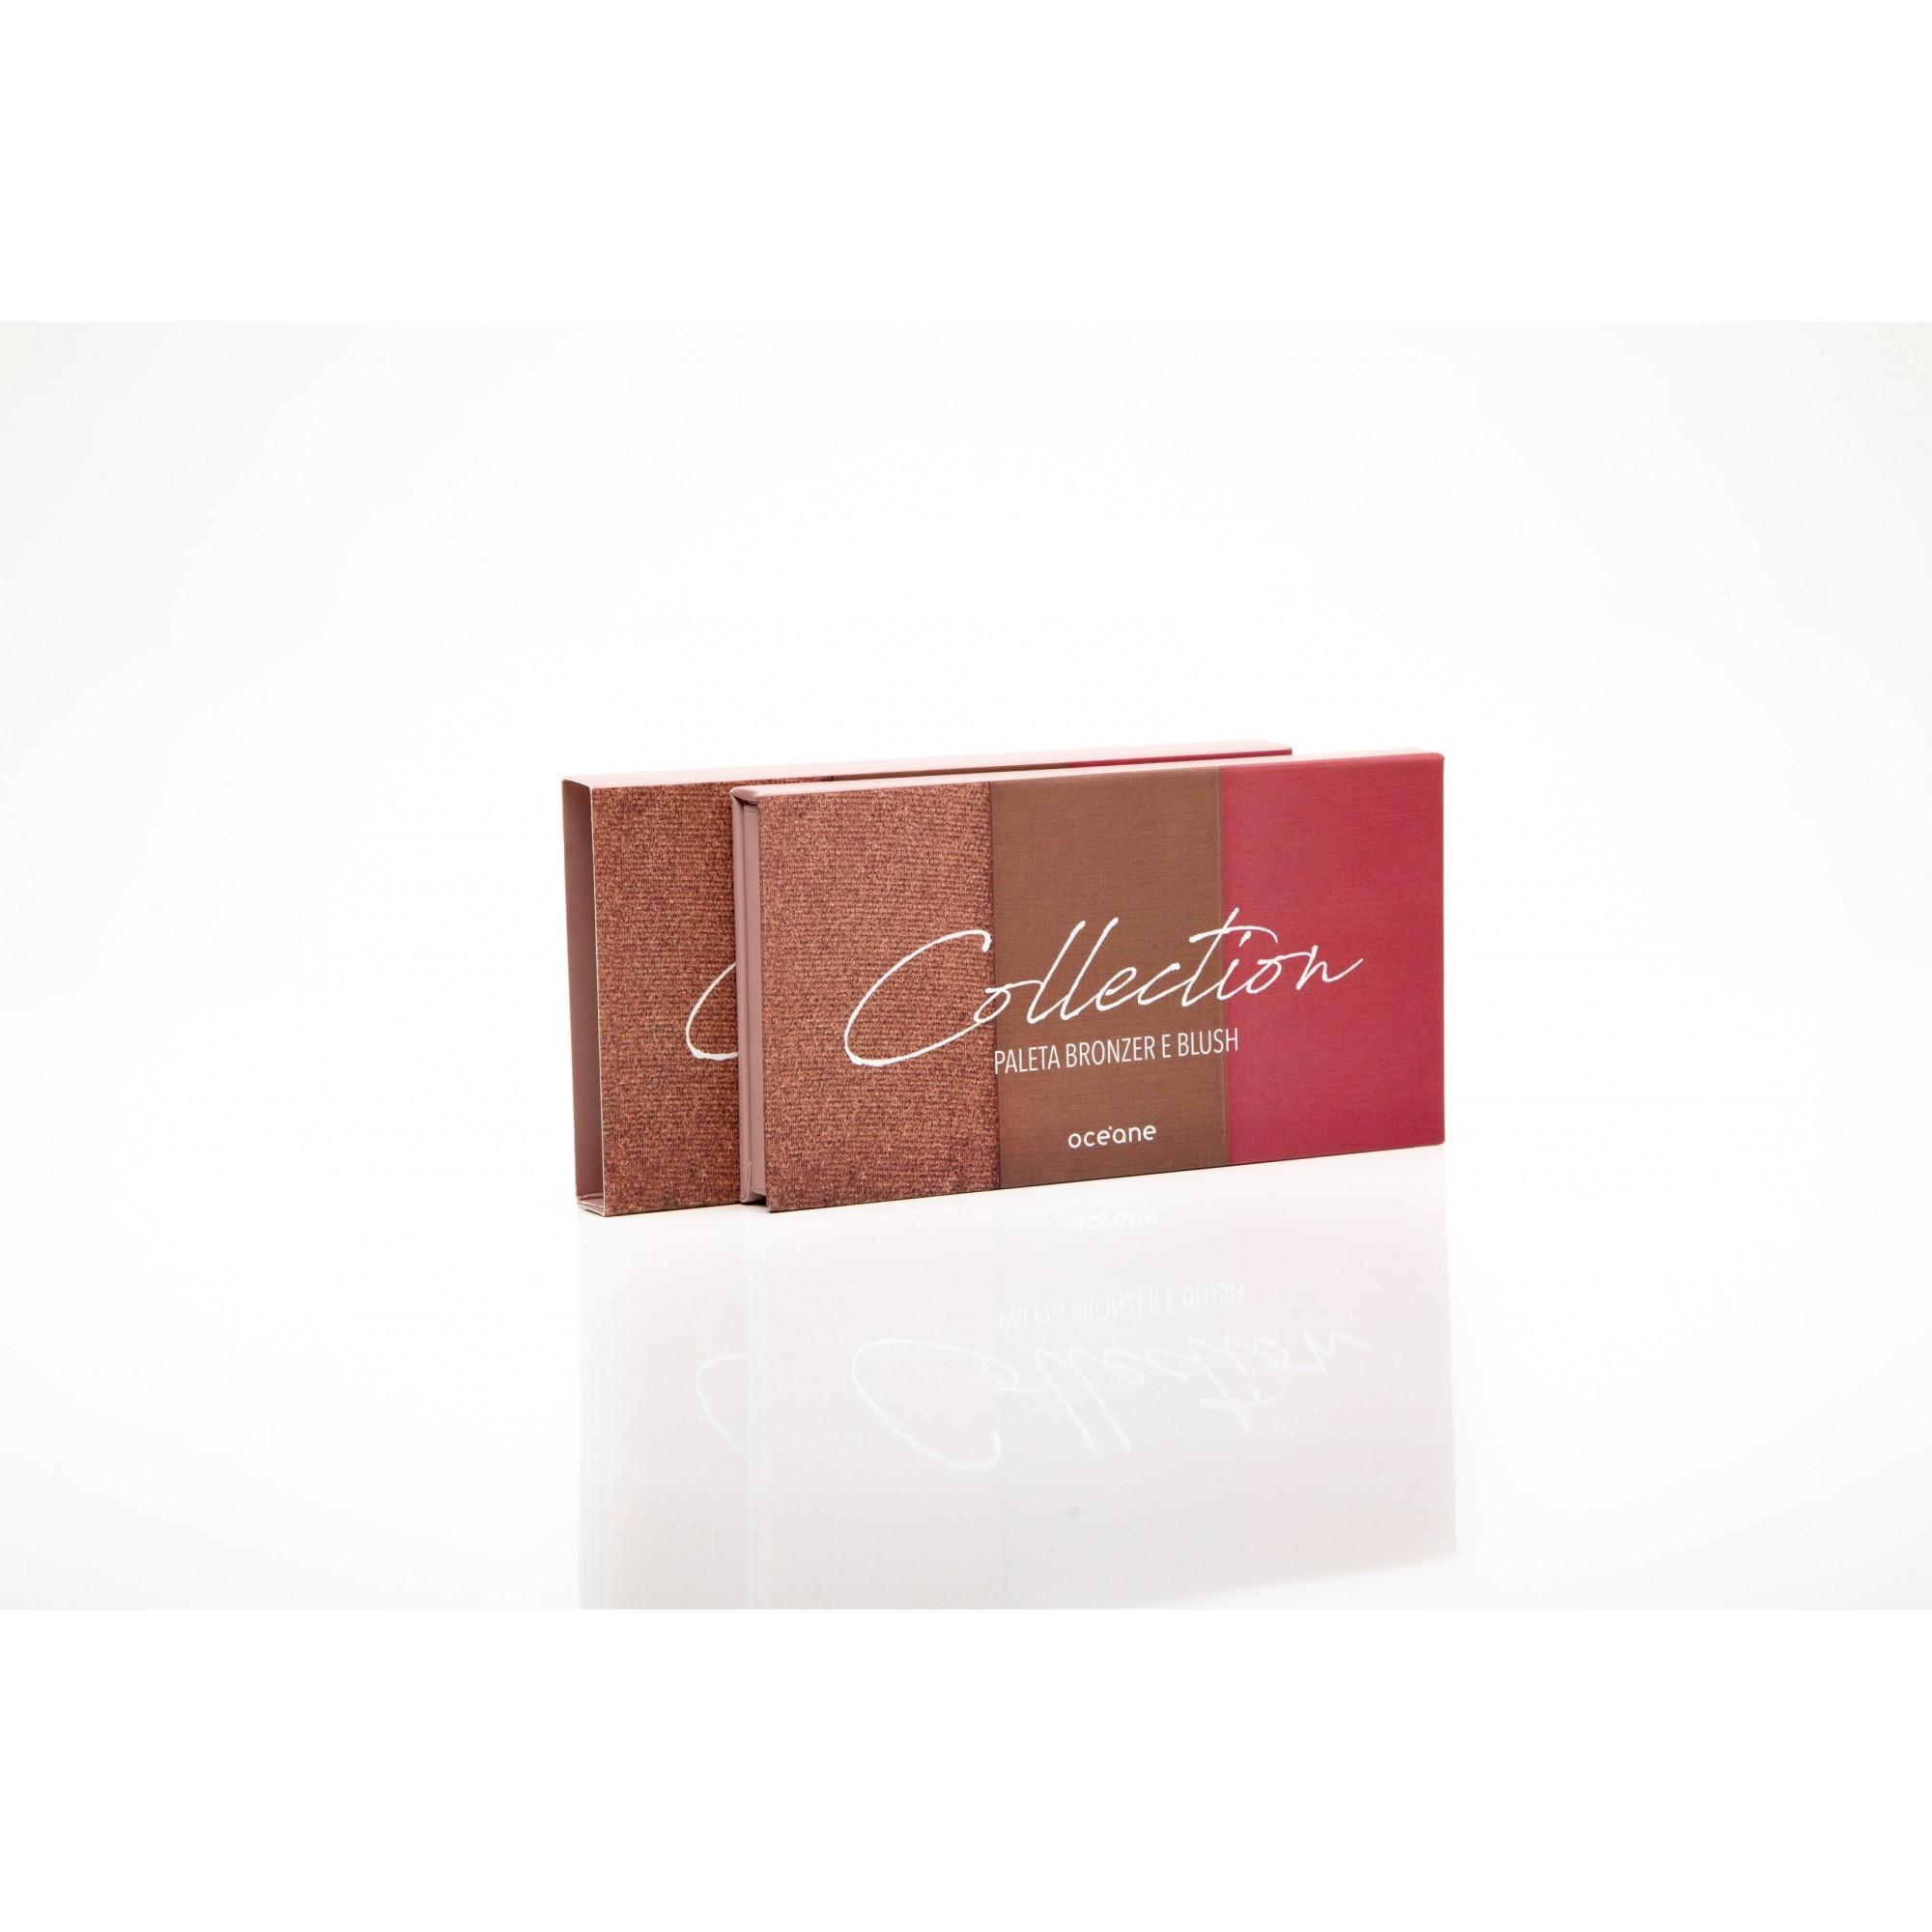 Paleta bronzer e blush collection